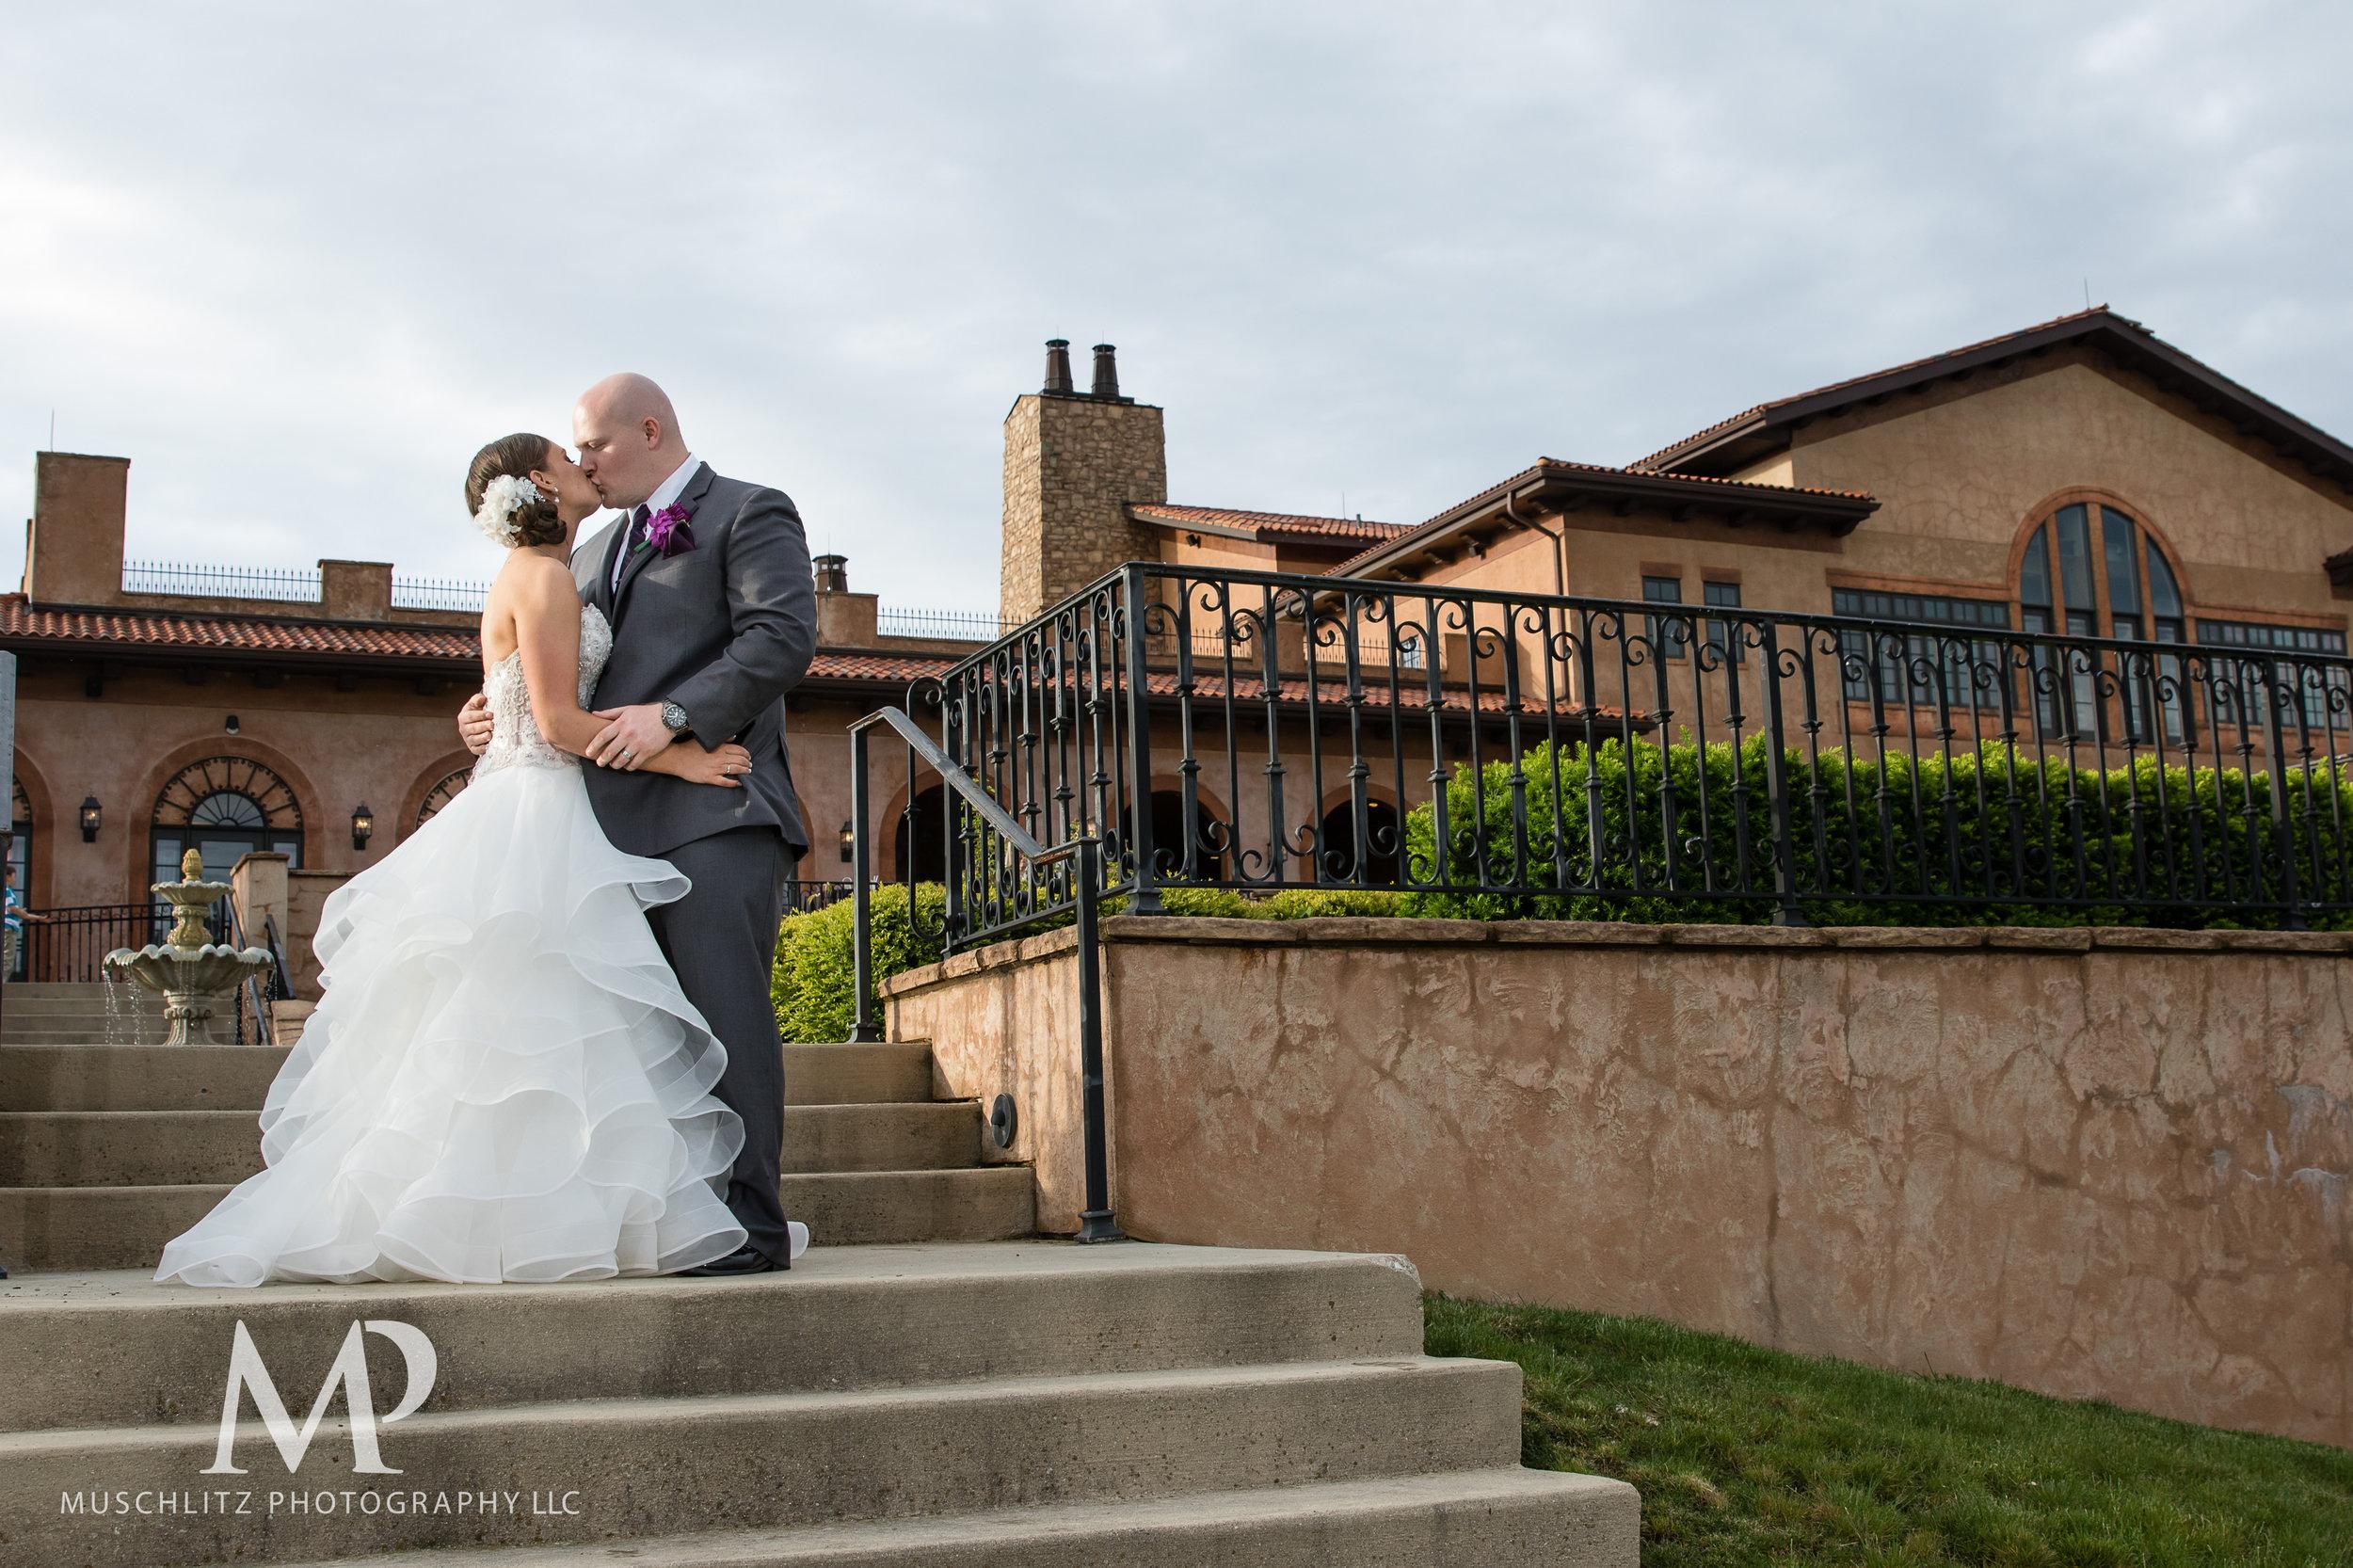 club-at-corazon-wedding-ceremony-reception-columbus-dublin-ohio-ohio-university-theme-055.JPG